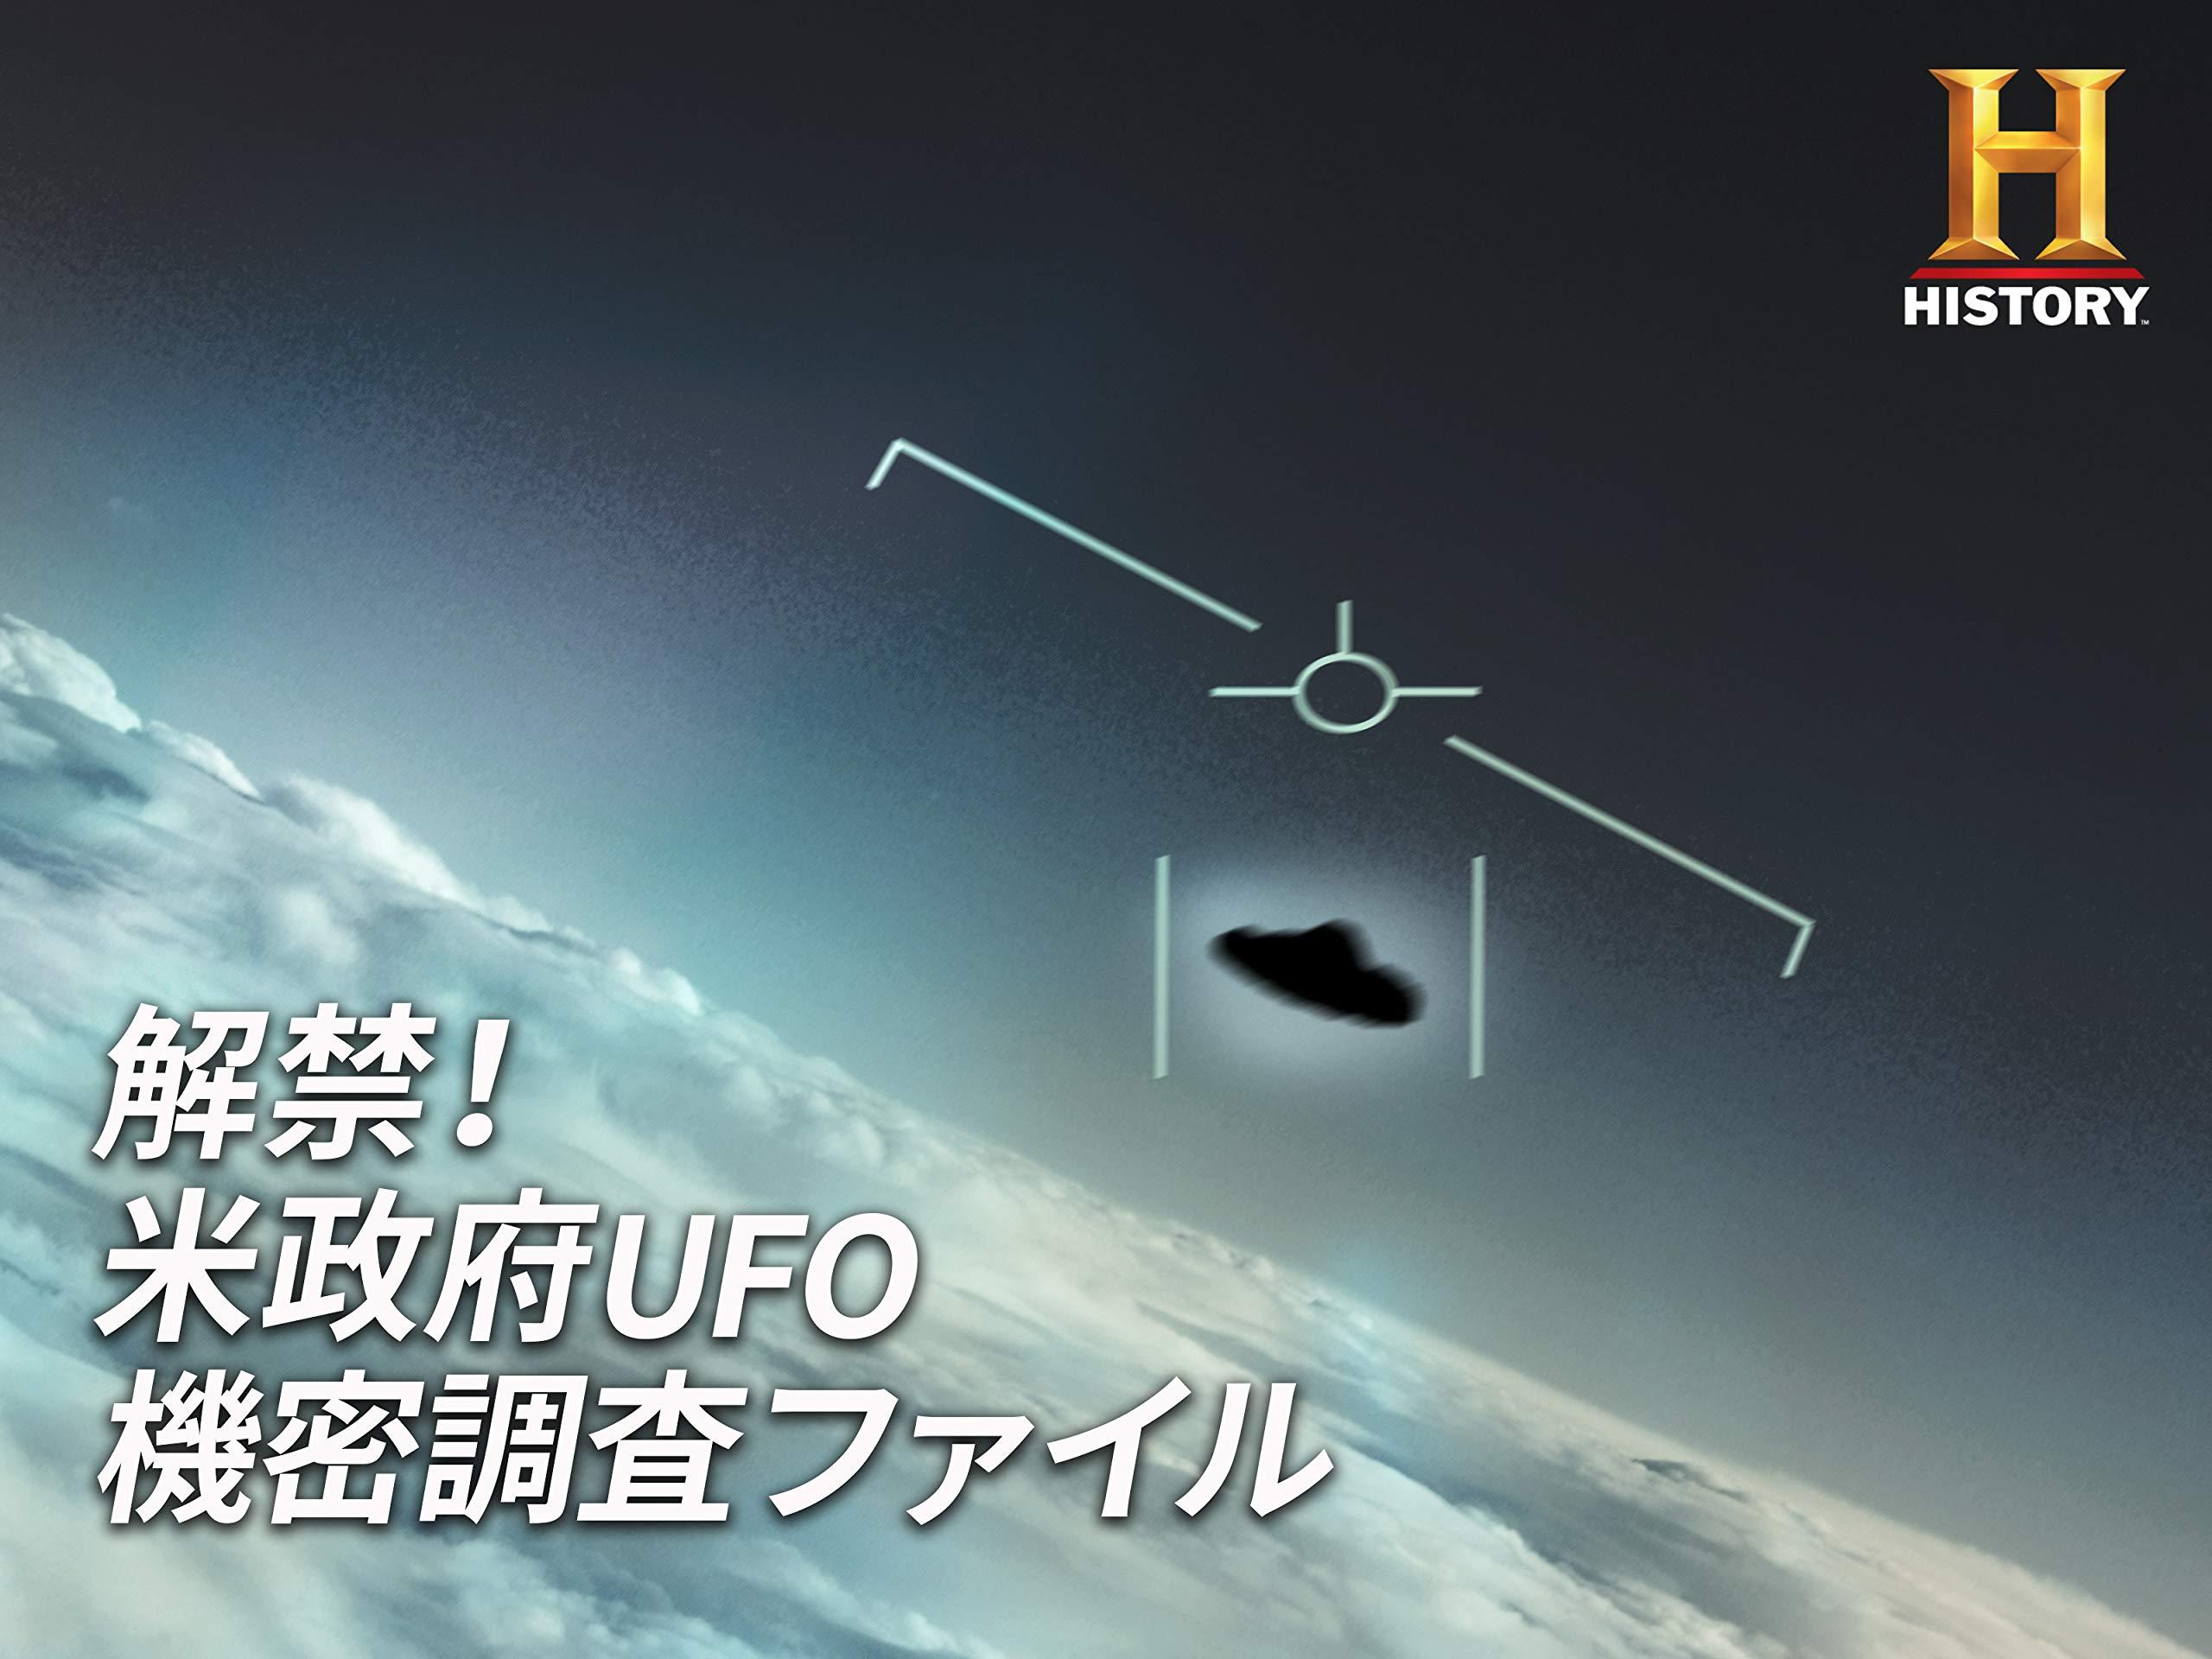 Amazon.co.jp: 解禁!米政府UFO機密調査ファイルを観る | Prime Video